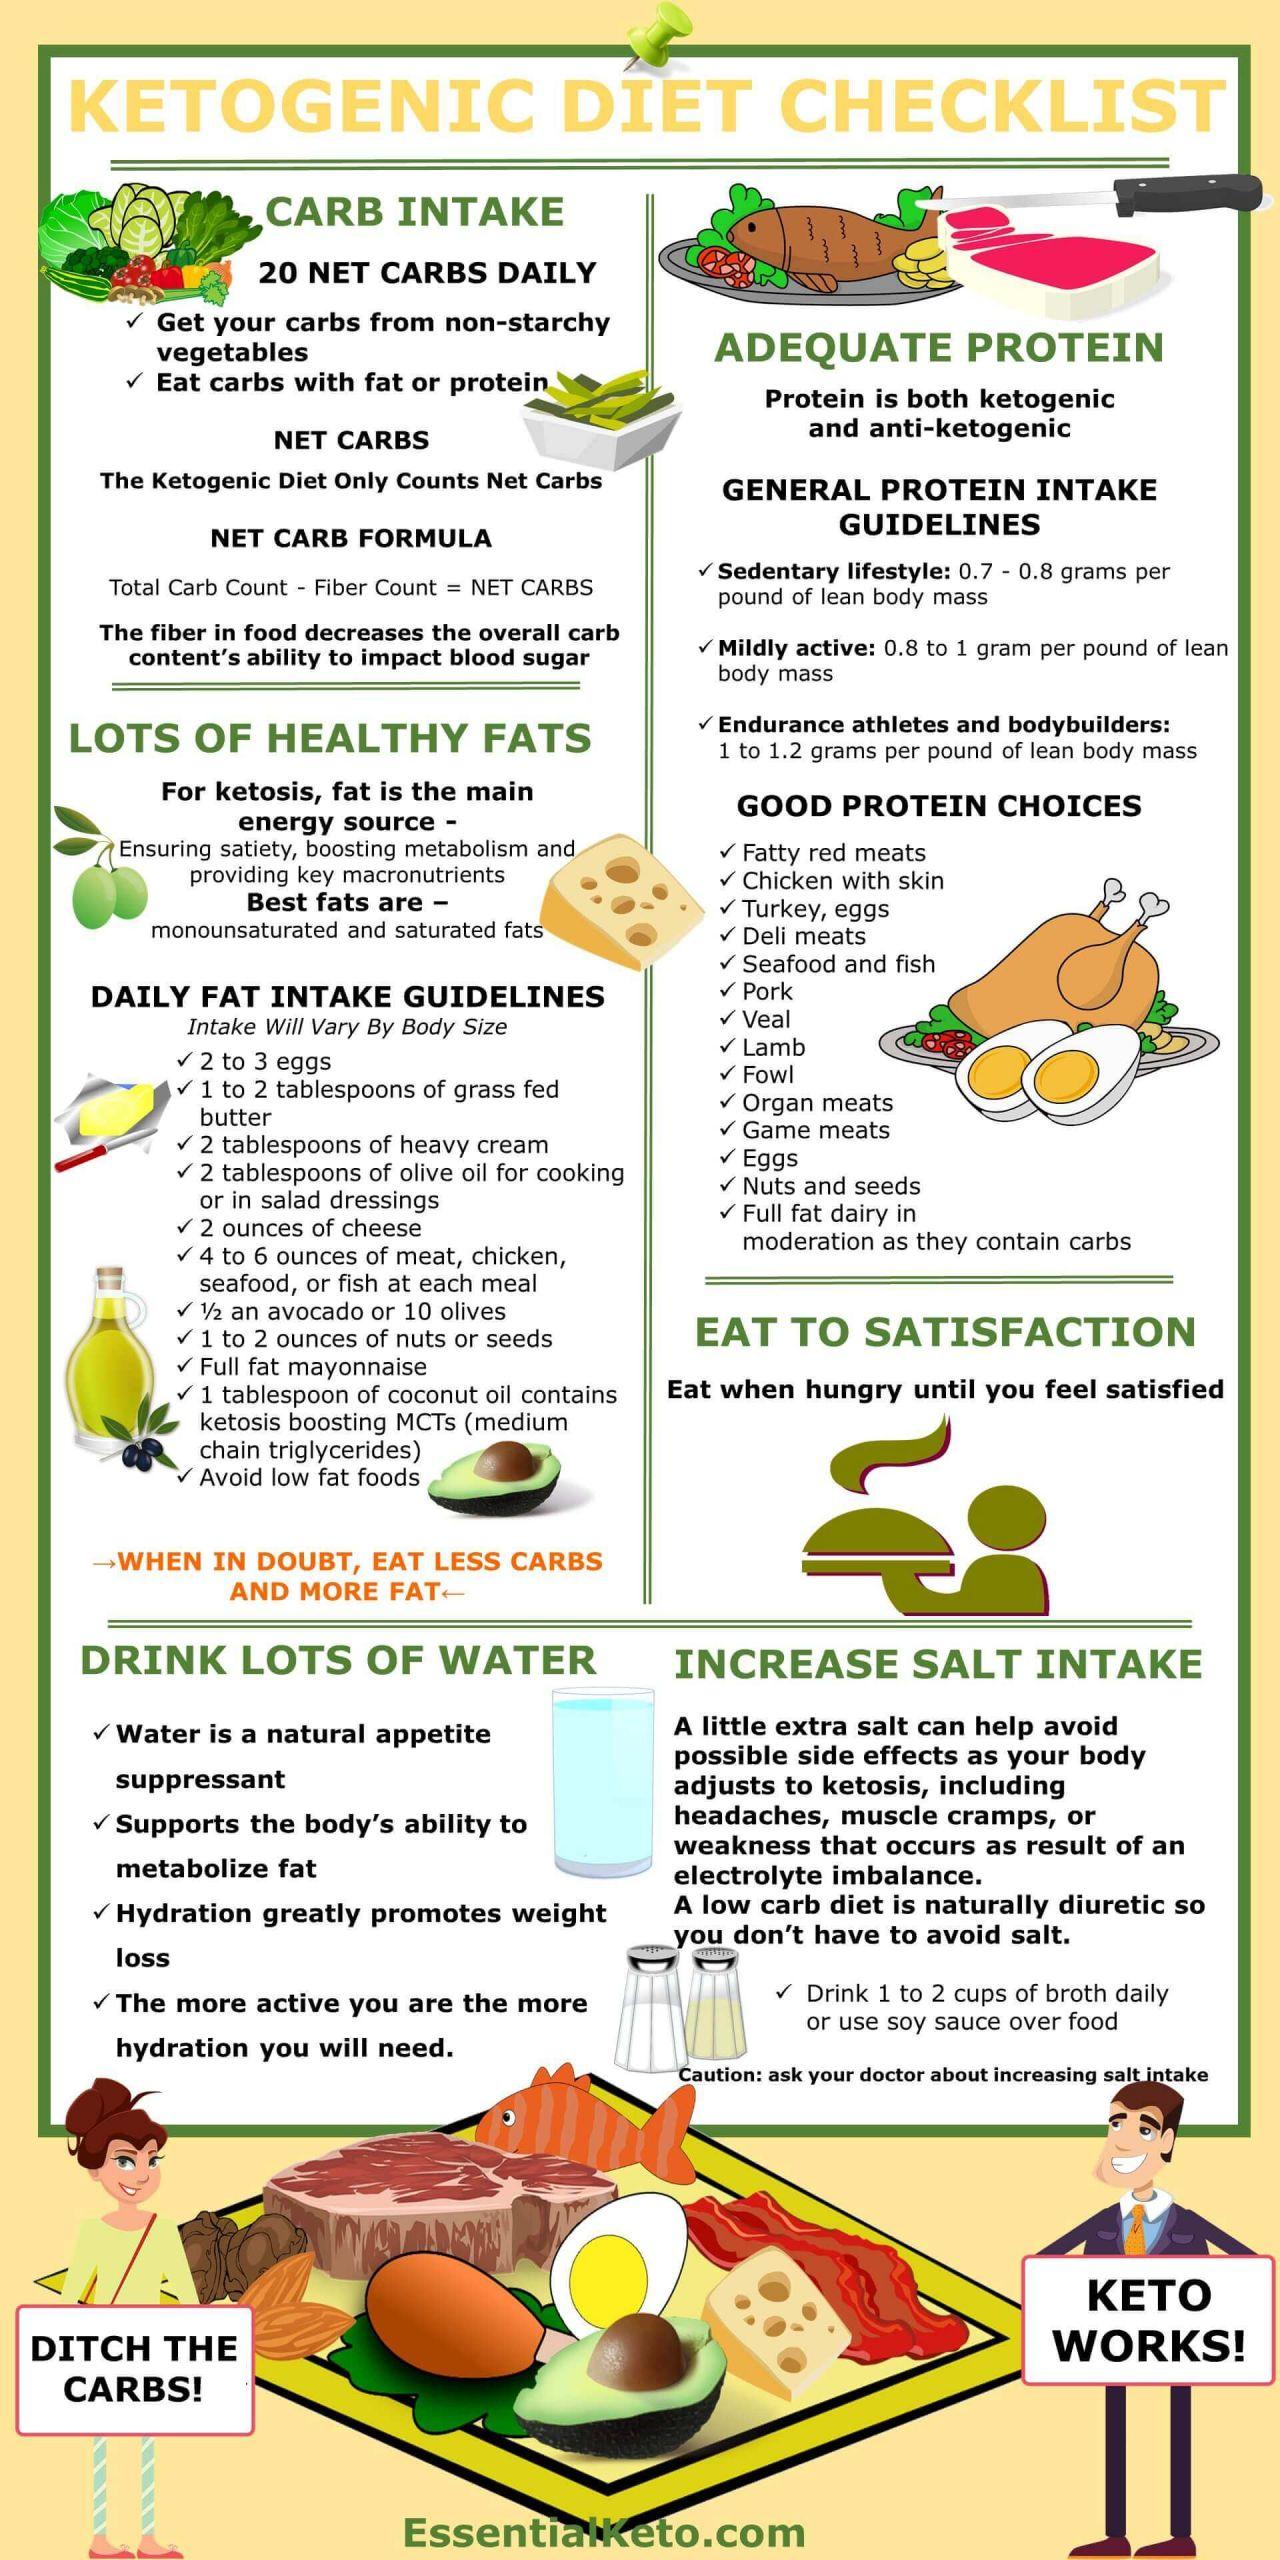 Keto Diet For Beginners Losing Weight Snacks  Ketogenic Diet Checklist